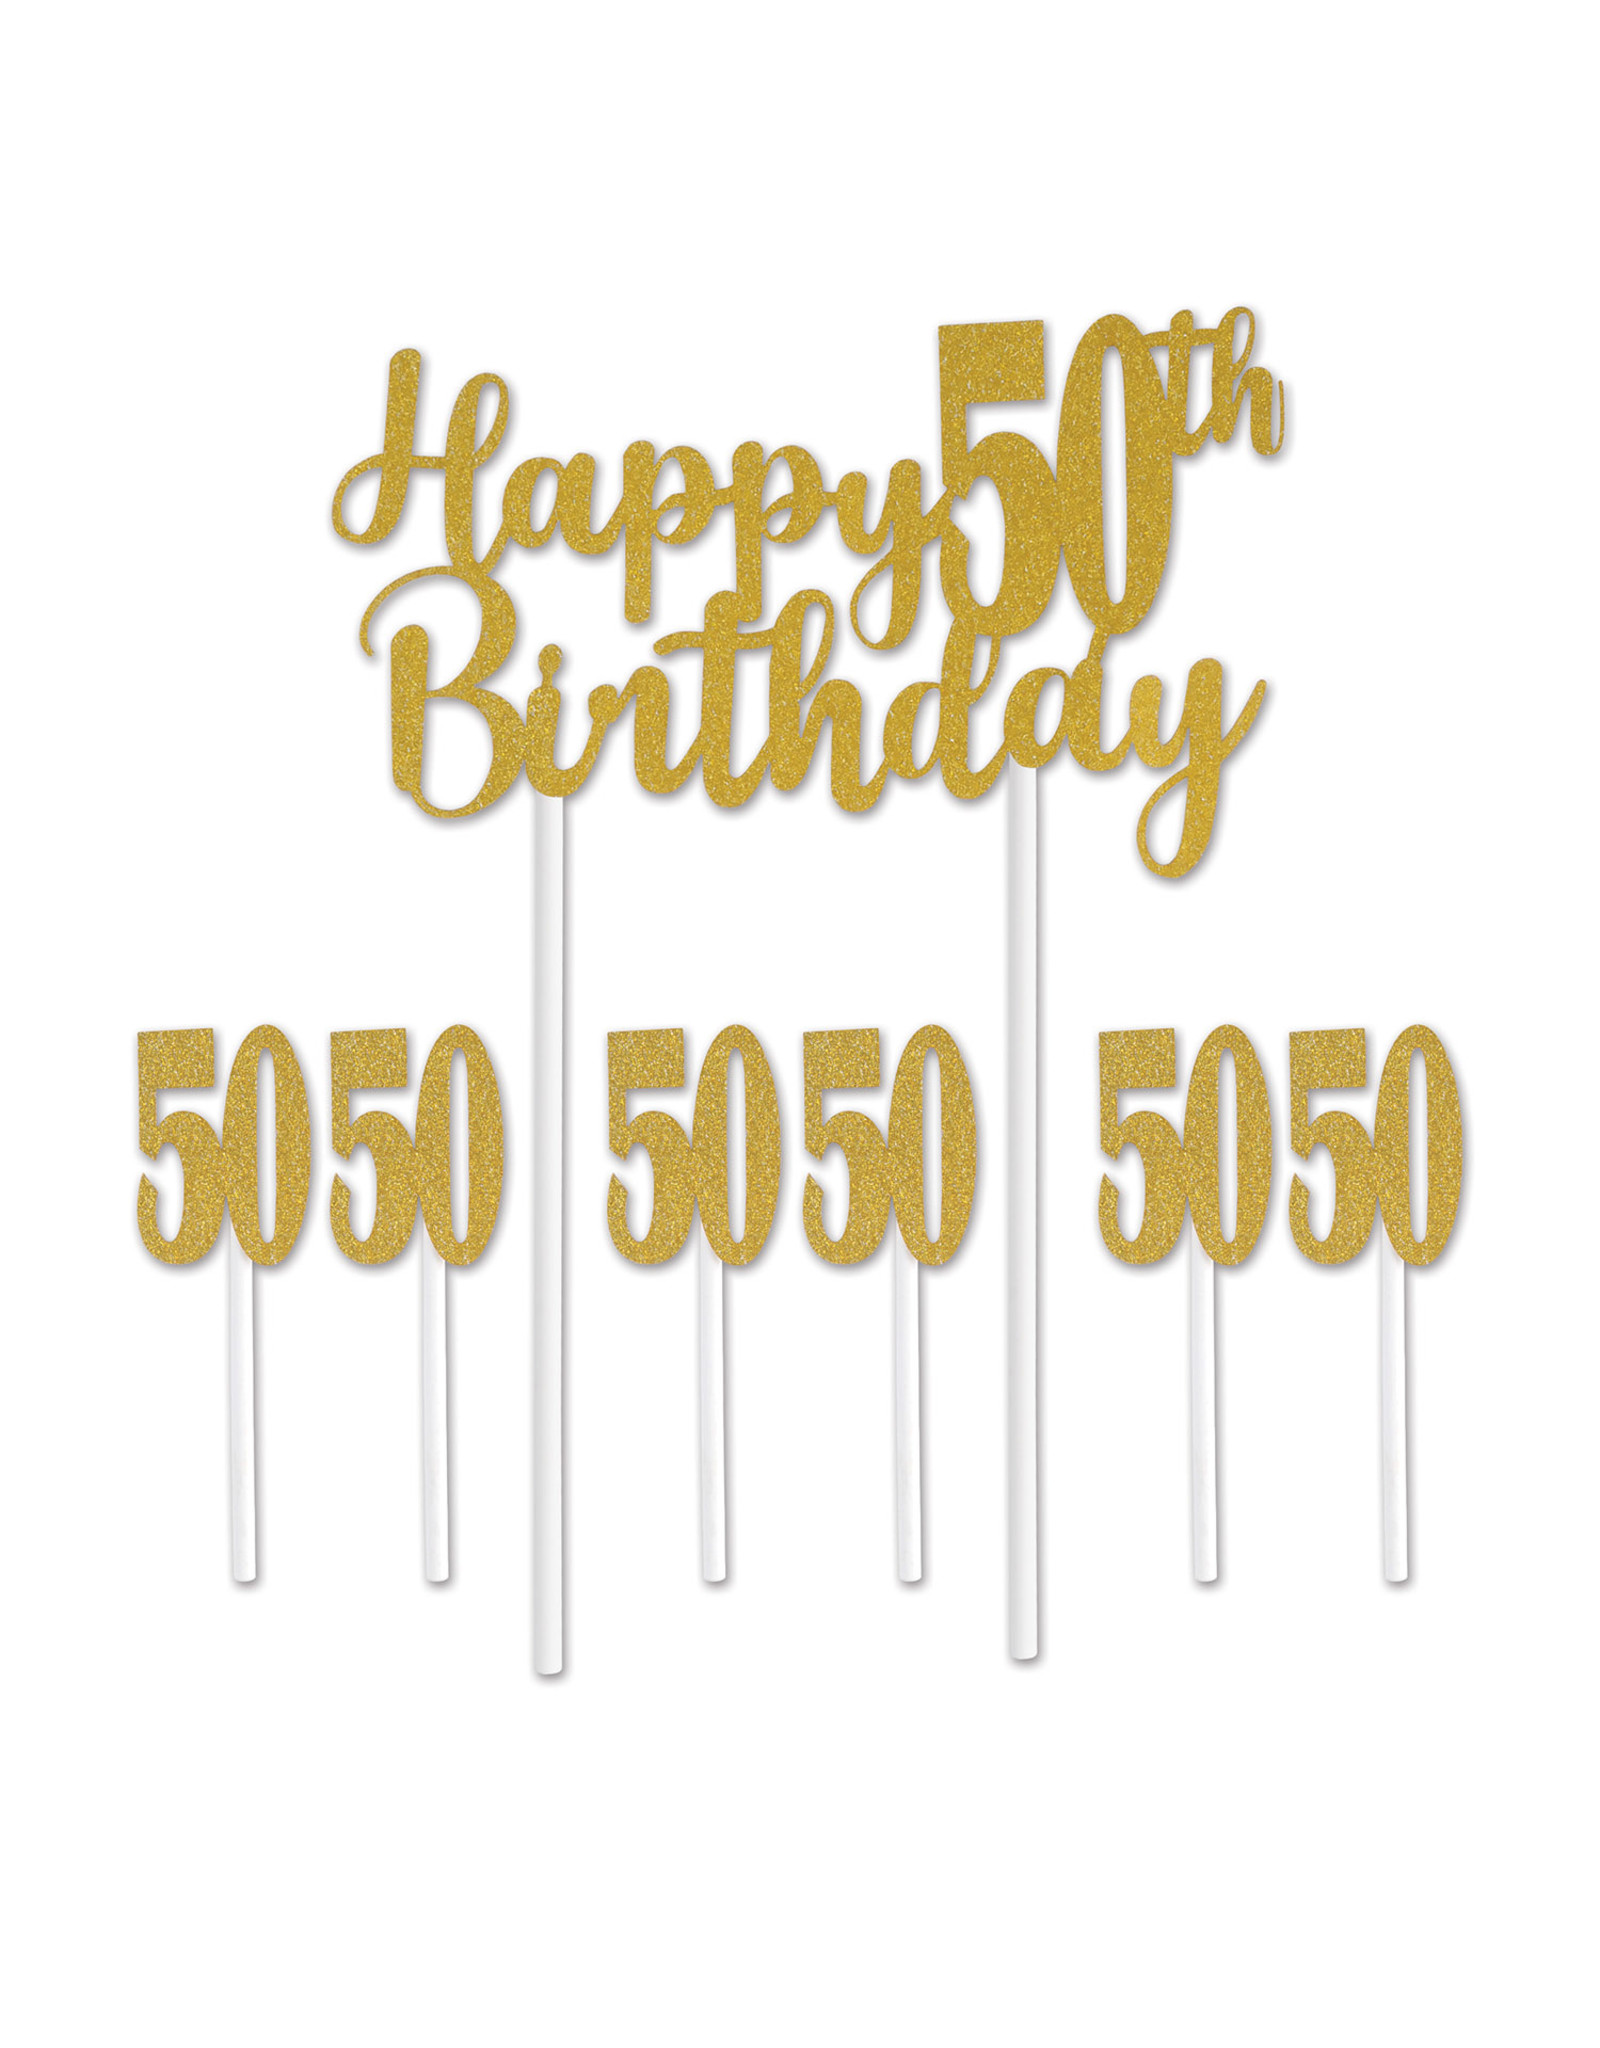 Beistle 50th Birthday Cake Topper